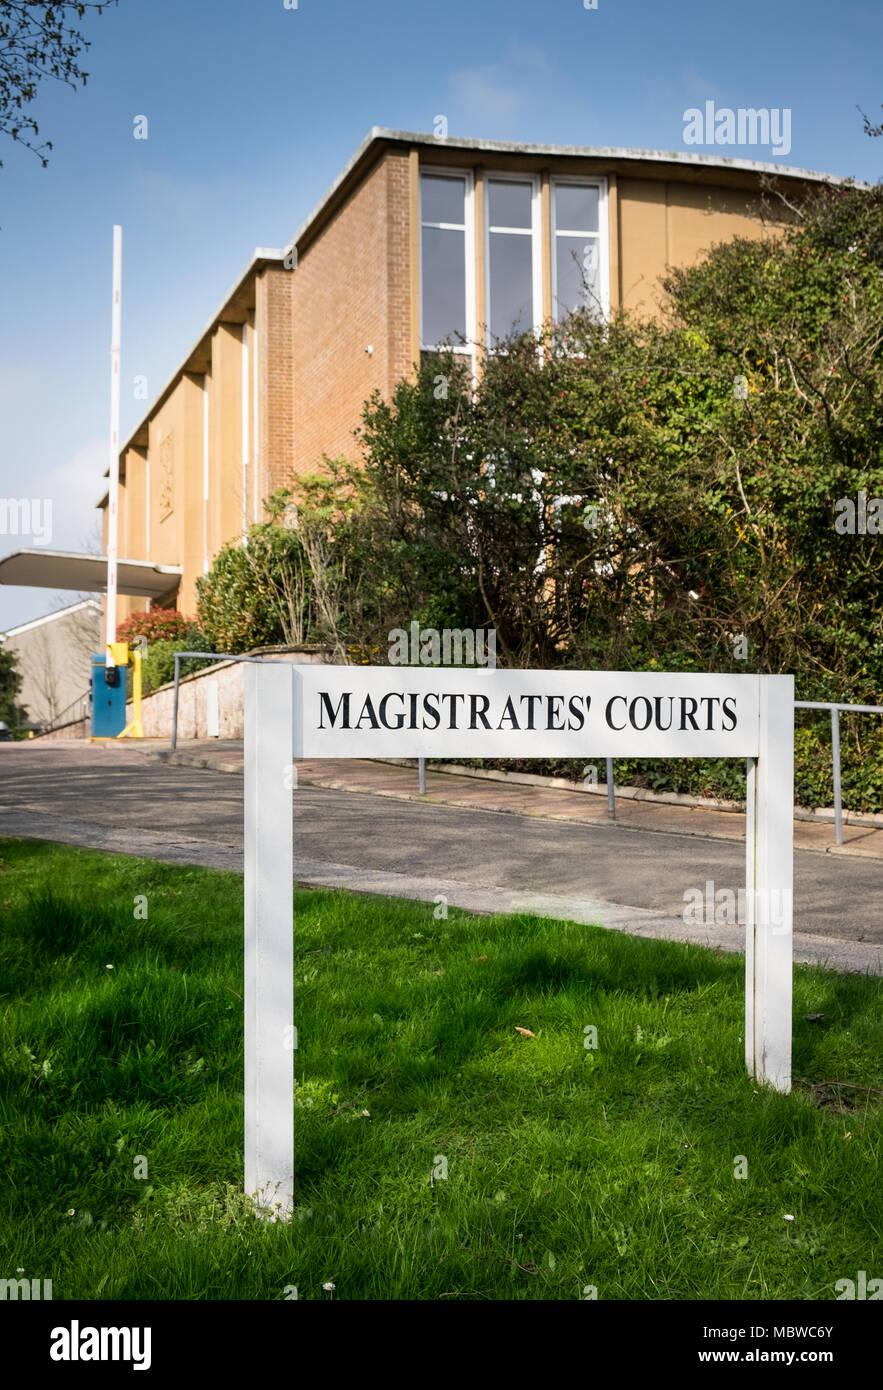 Central Devon Magistrates Court, Exeter, Devon,UK - Stock Image